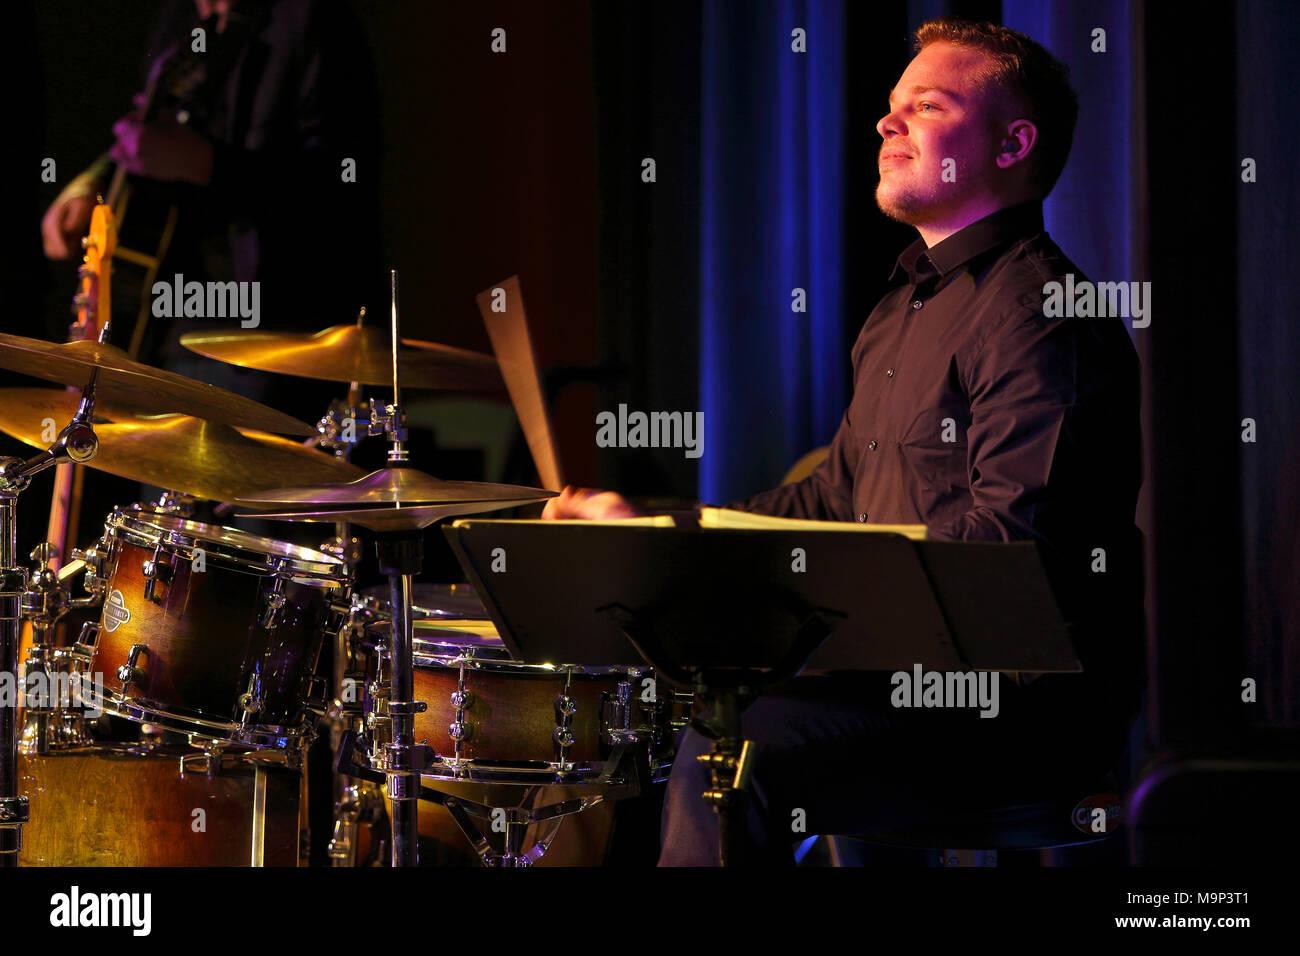 Jazz drummer Markus Lämmel of Gerold Heitbaum Quartet in concert, Wittenberg, Saxony-Anhalt, Germany - Stock Image